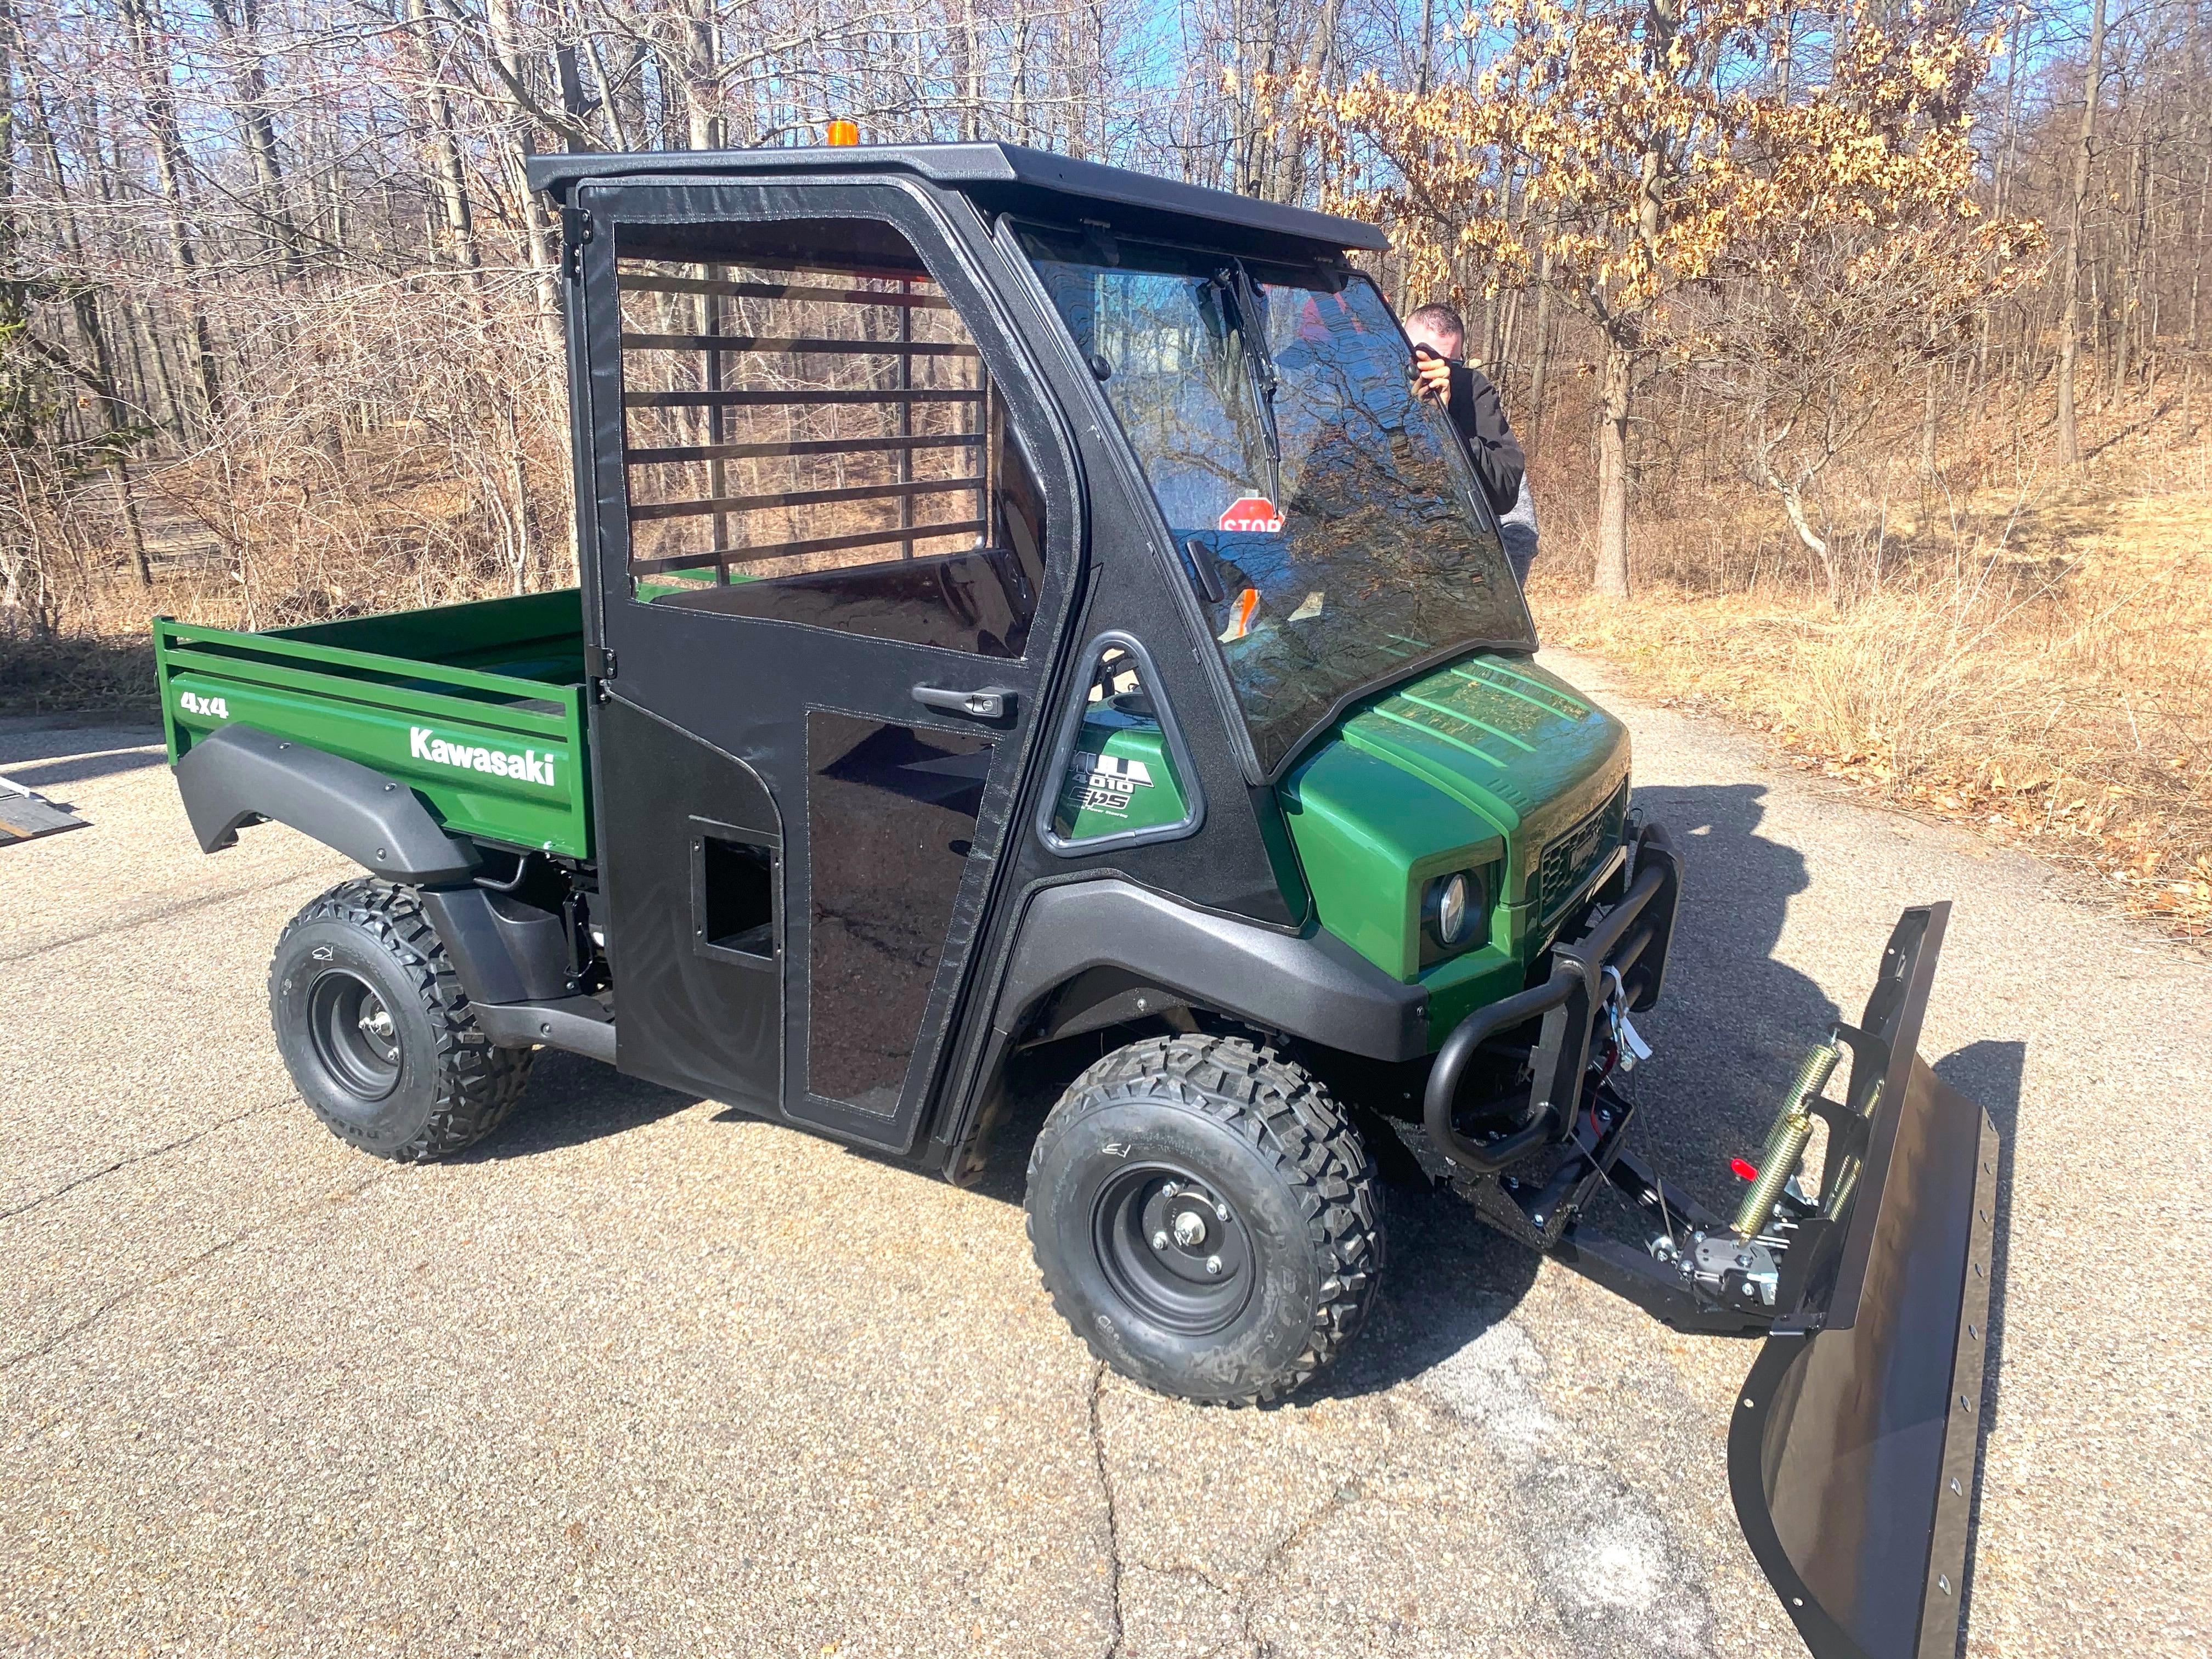 Zeigler Auto Group donates Kawasaki Mule Side by Side to Sherman Lake YMCA